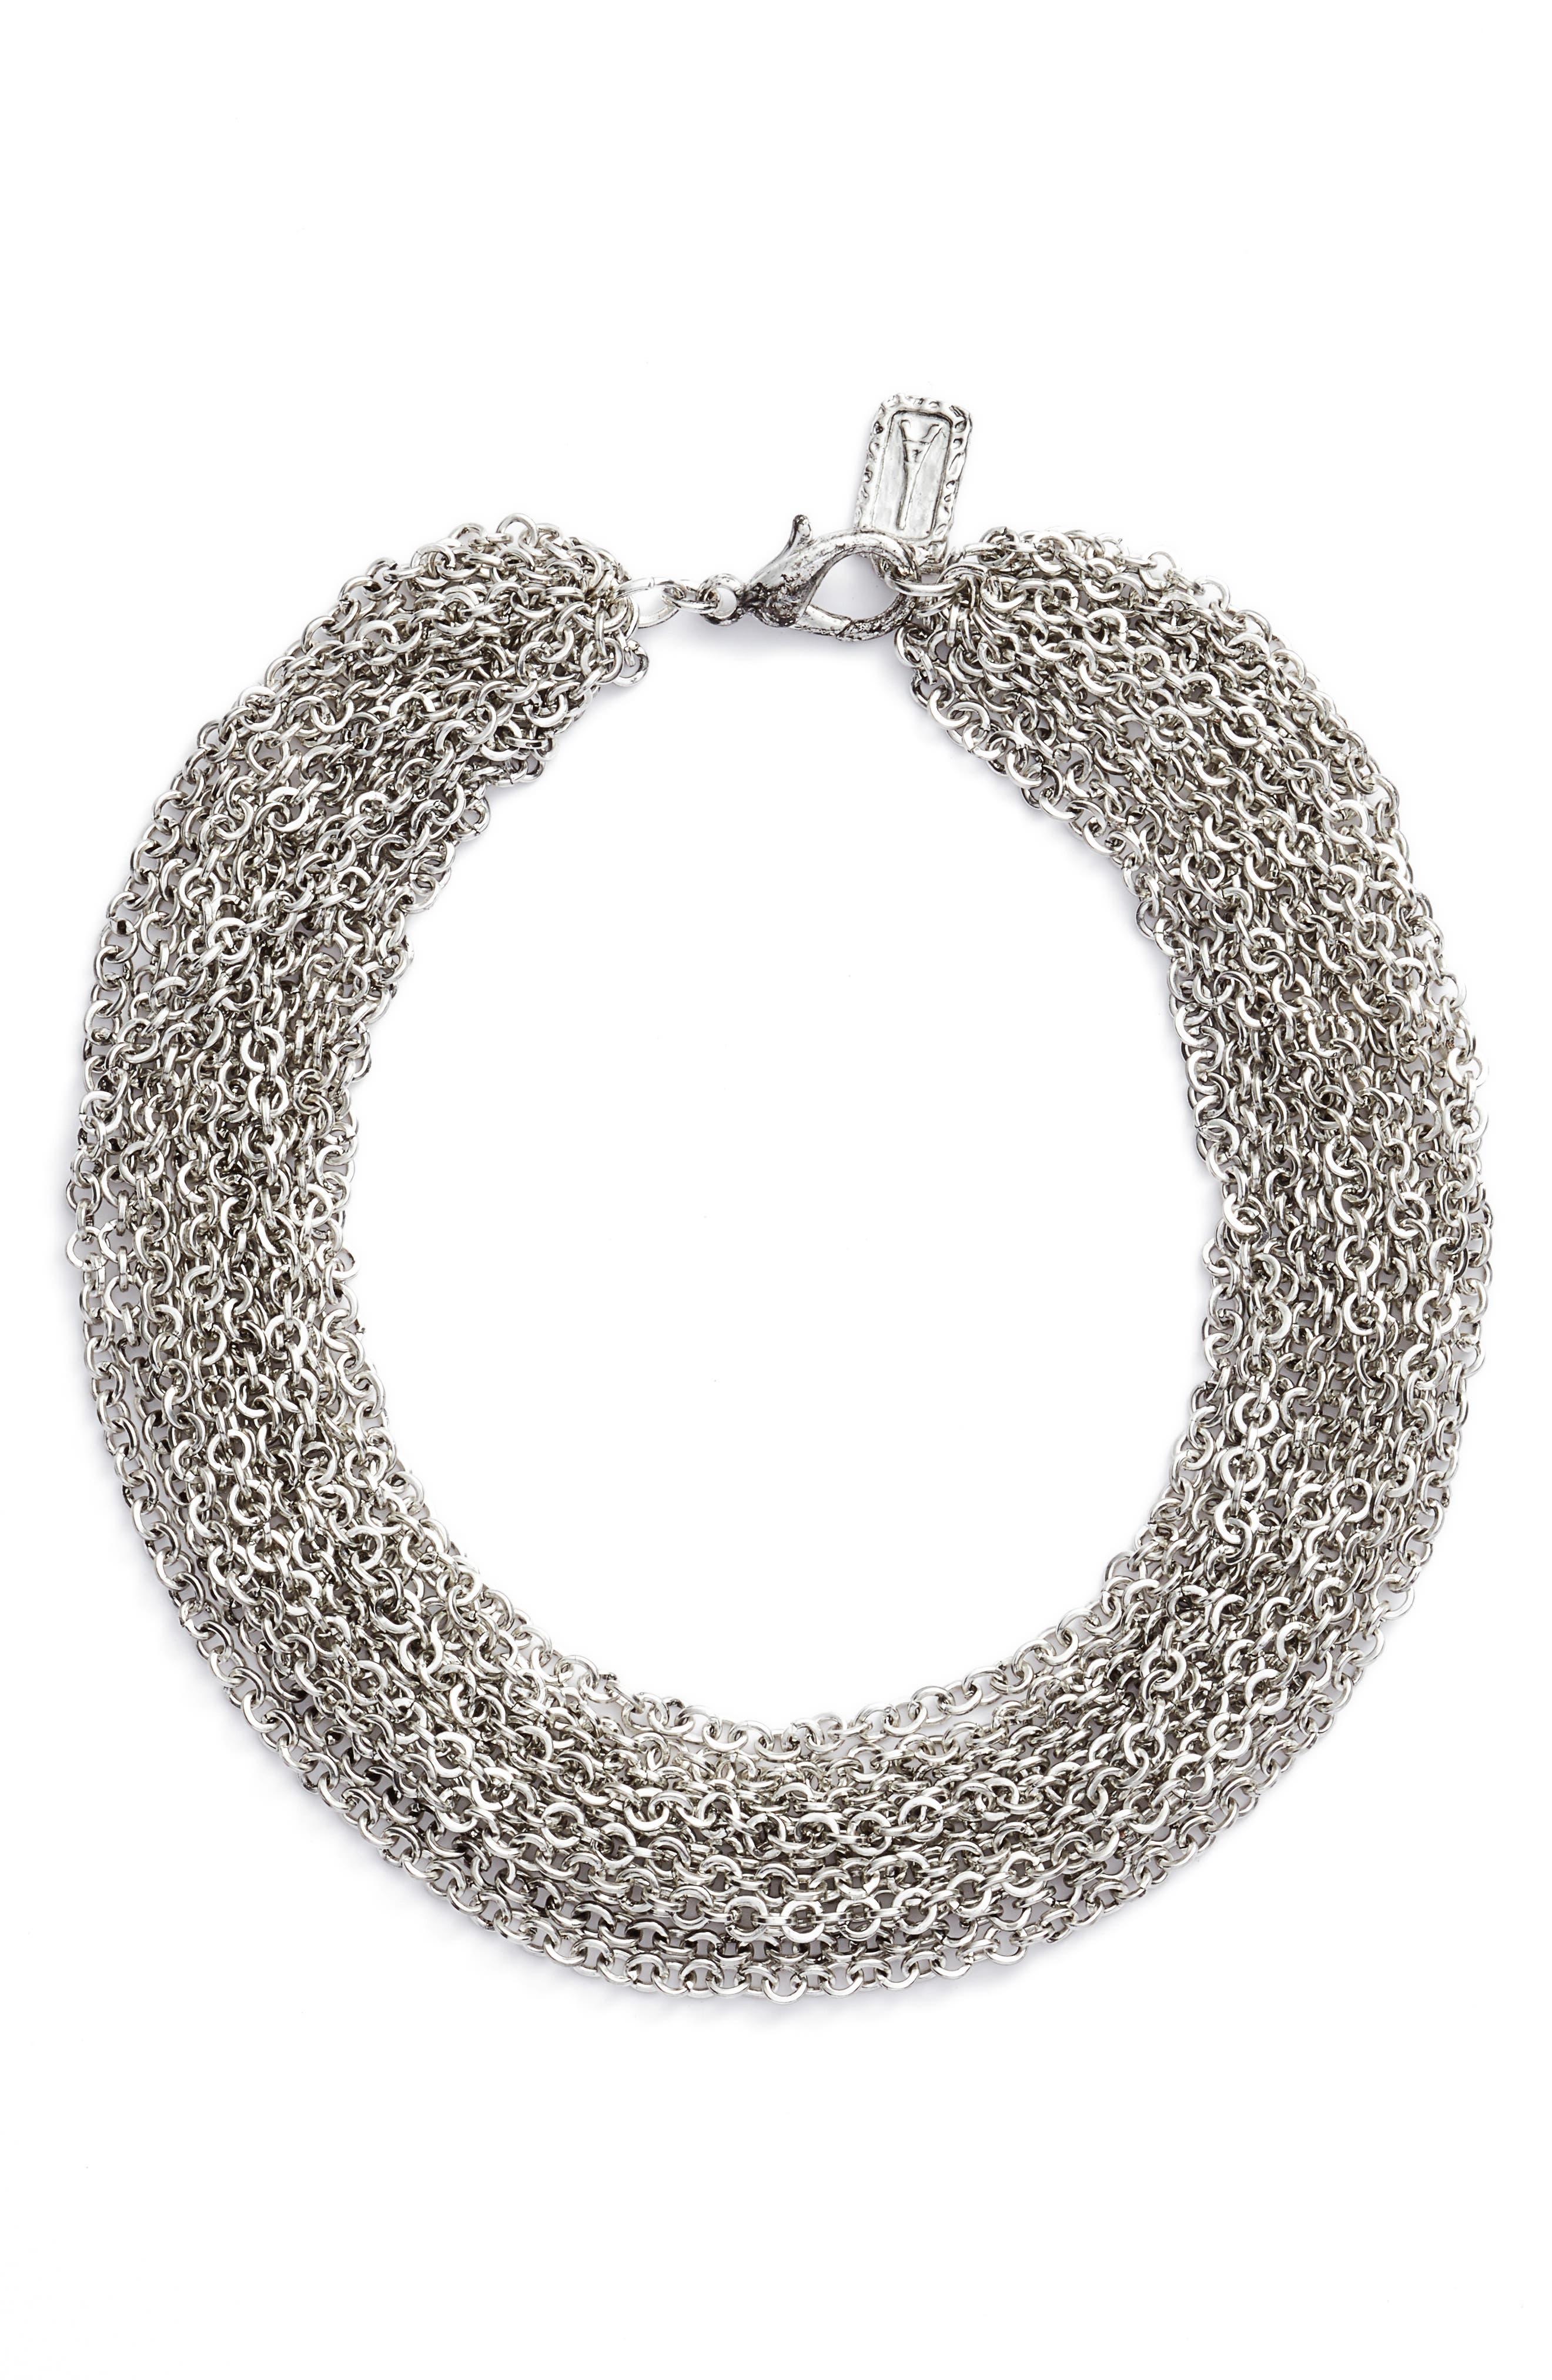 Adeline Collar Necklace,                             Main thumbnail 1, color,                             SILVER